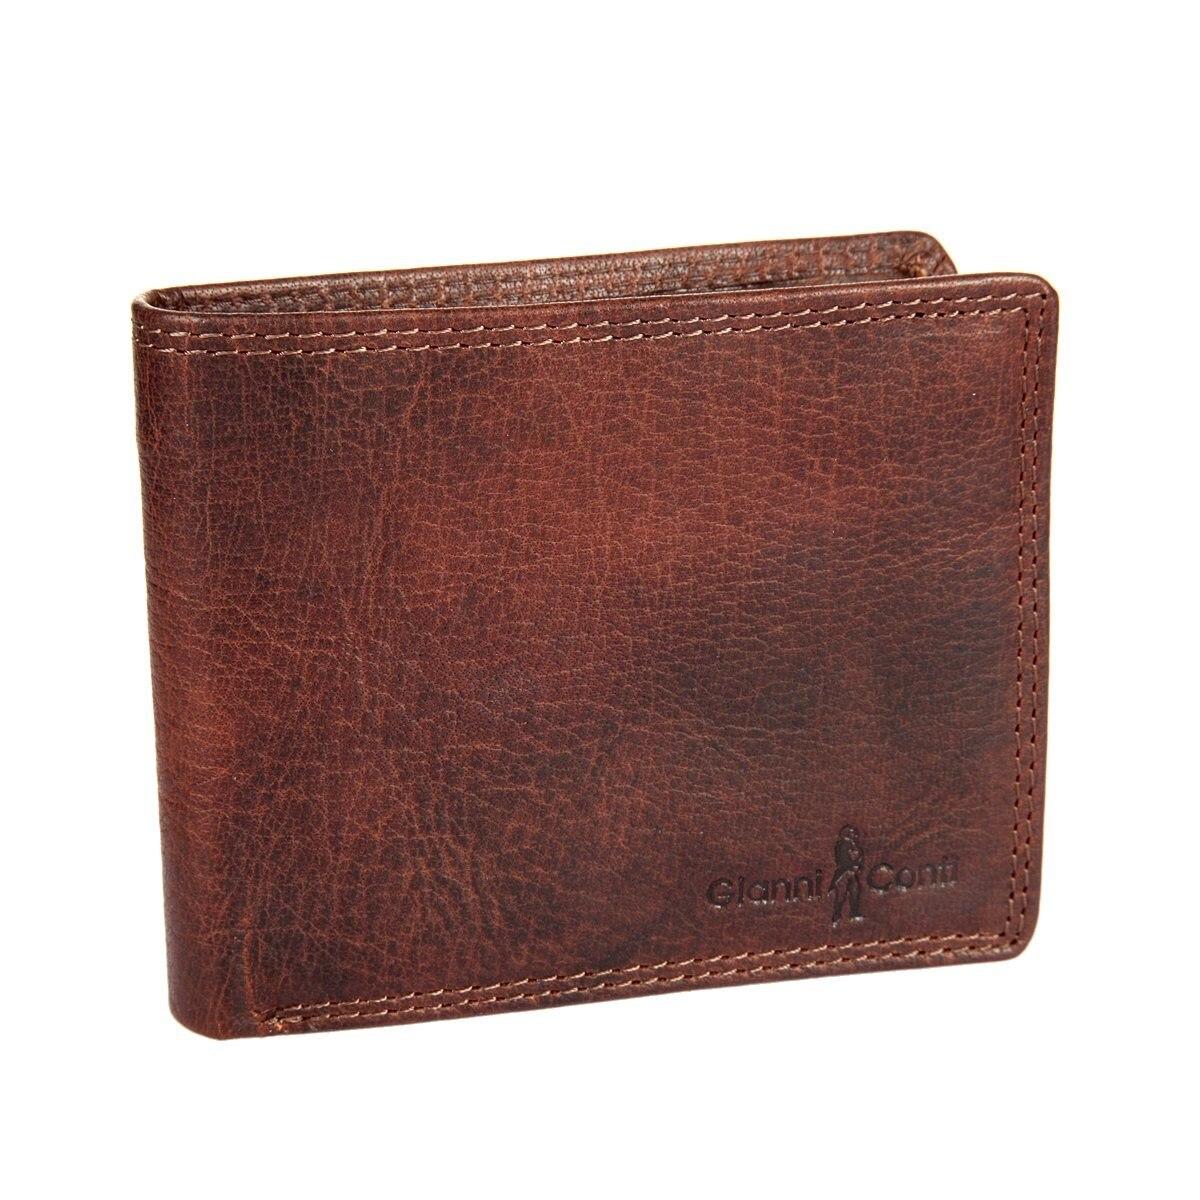 Coin Purse Gianni Conti 1077142 Tan кожаные сумки gianni conti 912150 tan